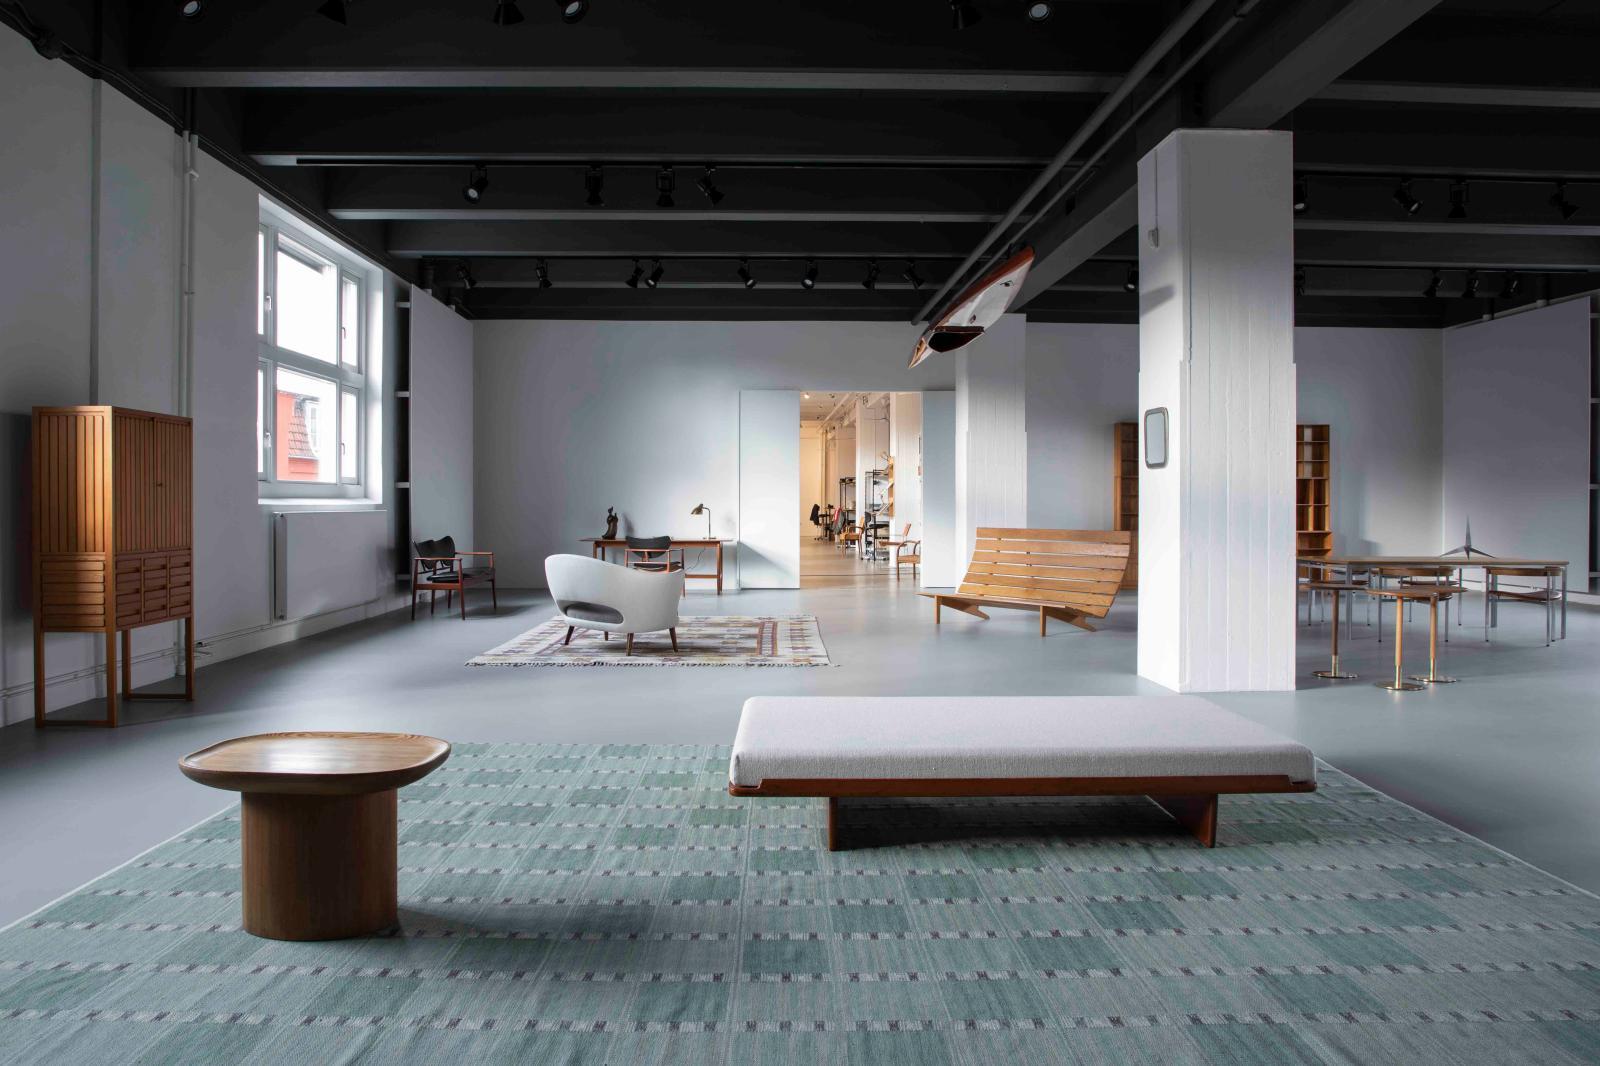 The Dansk Møbelkunst gallery in Copenhagen contains a showroom, a furniture restoration workshop and archives on Danish furniture designers and factor